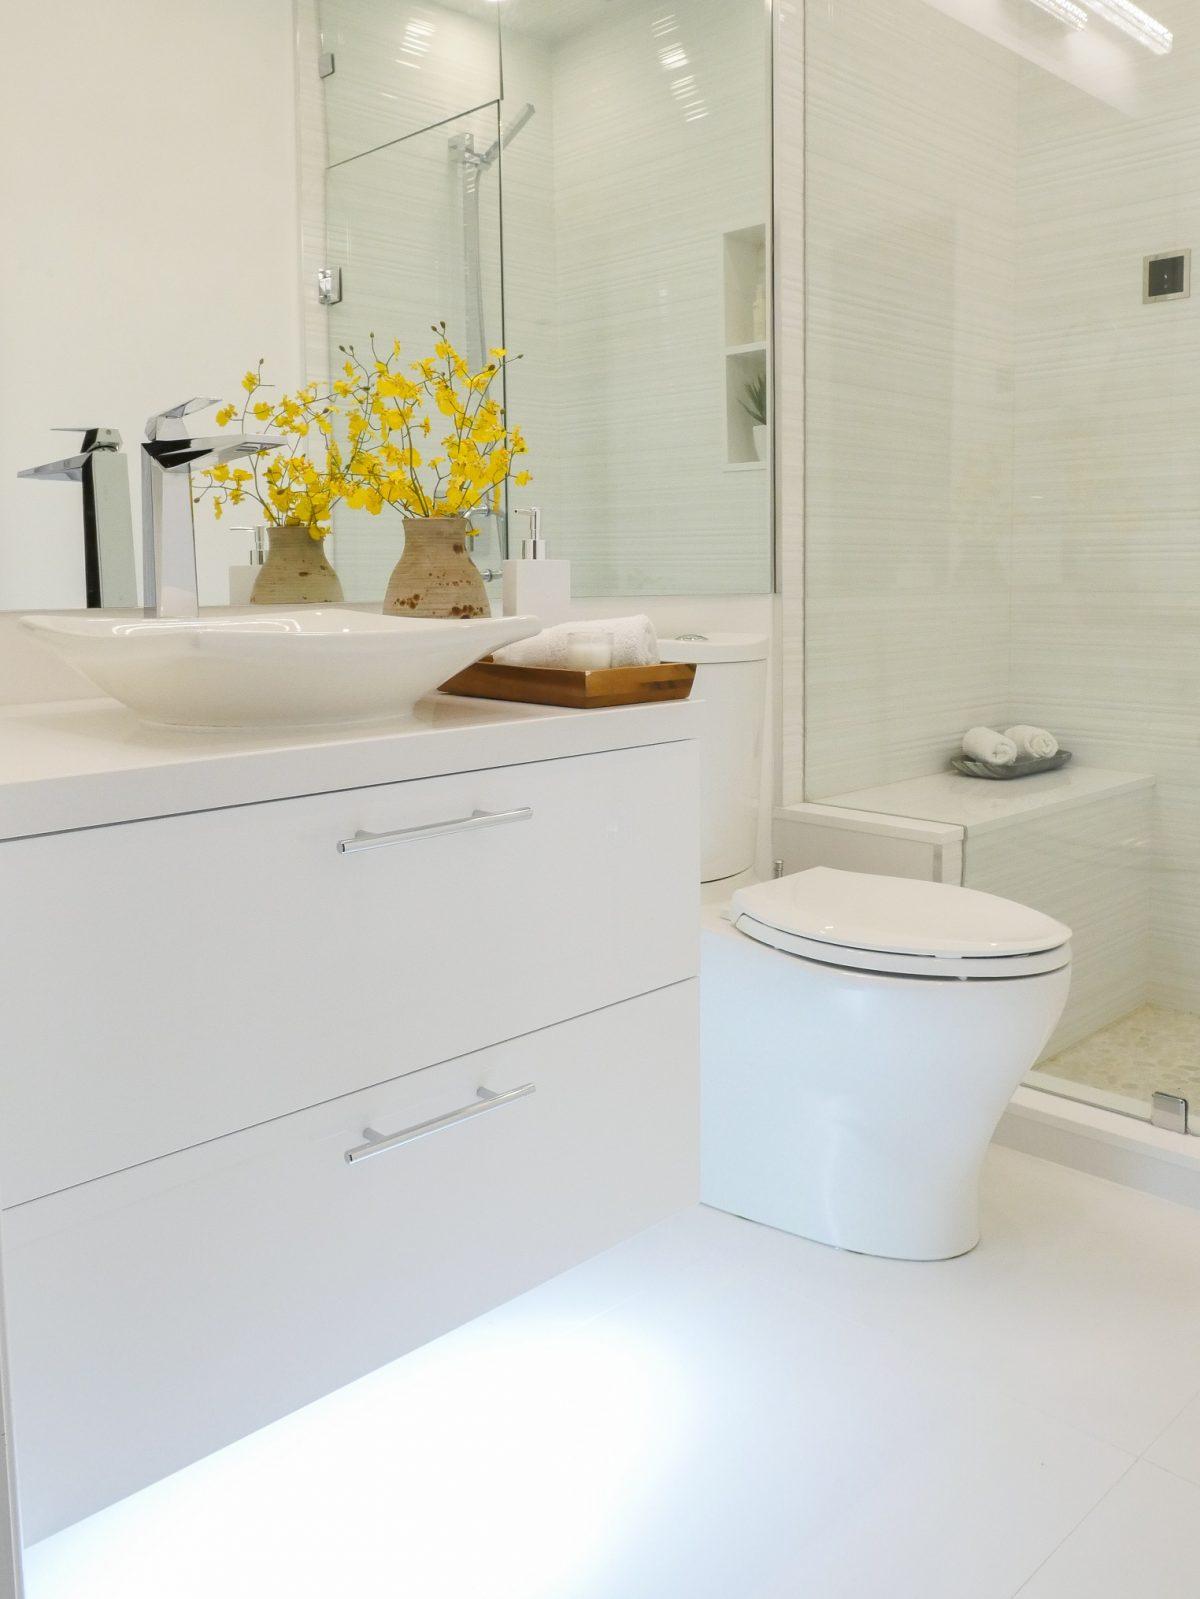 2017.03.31-Bathrooms-016